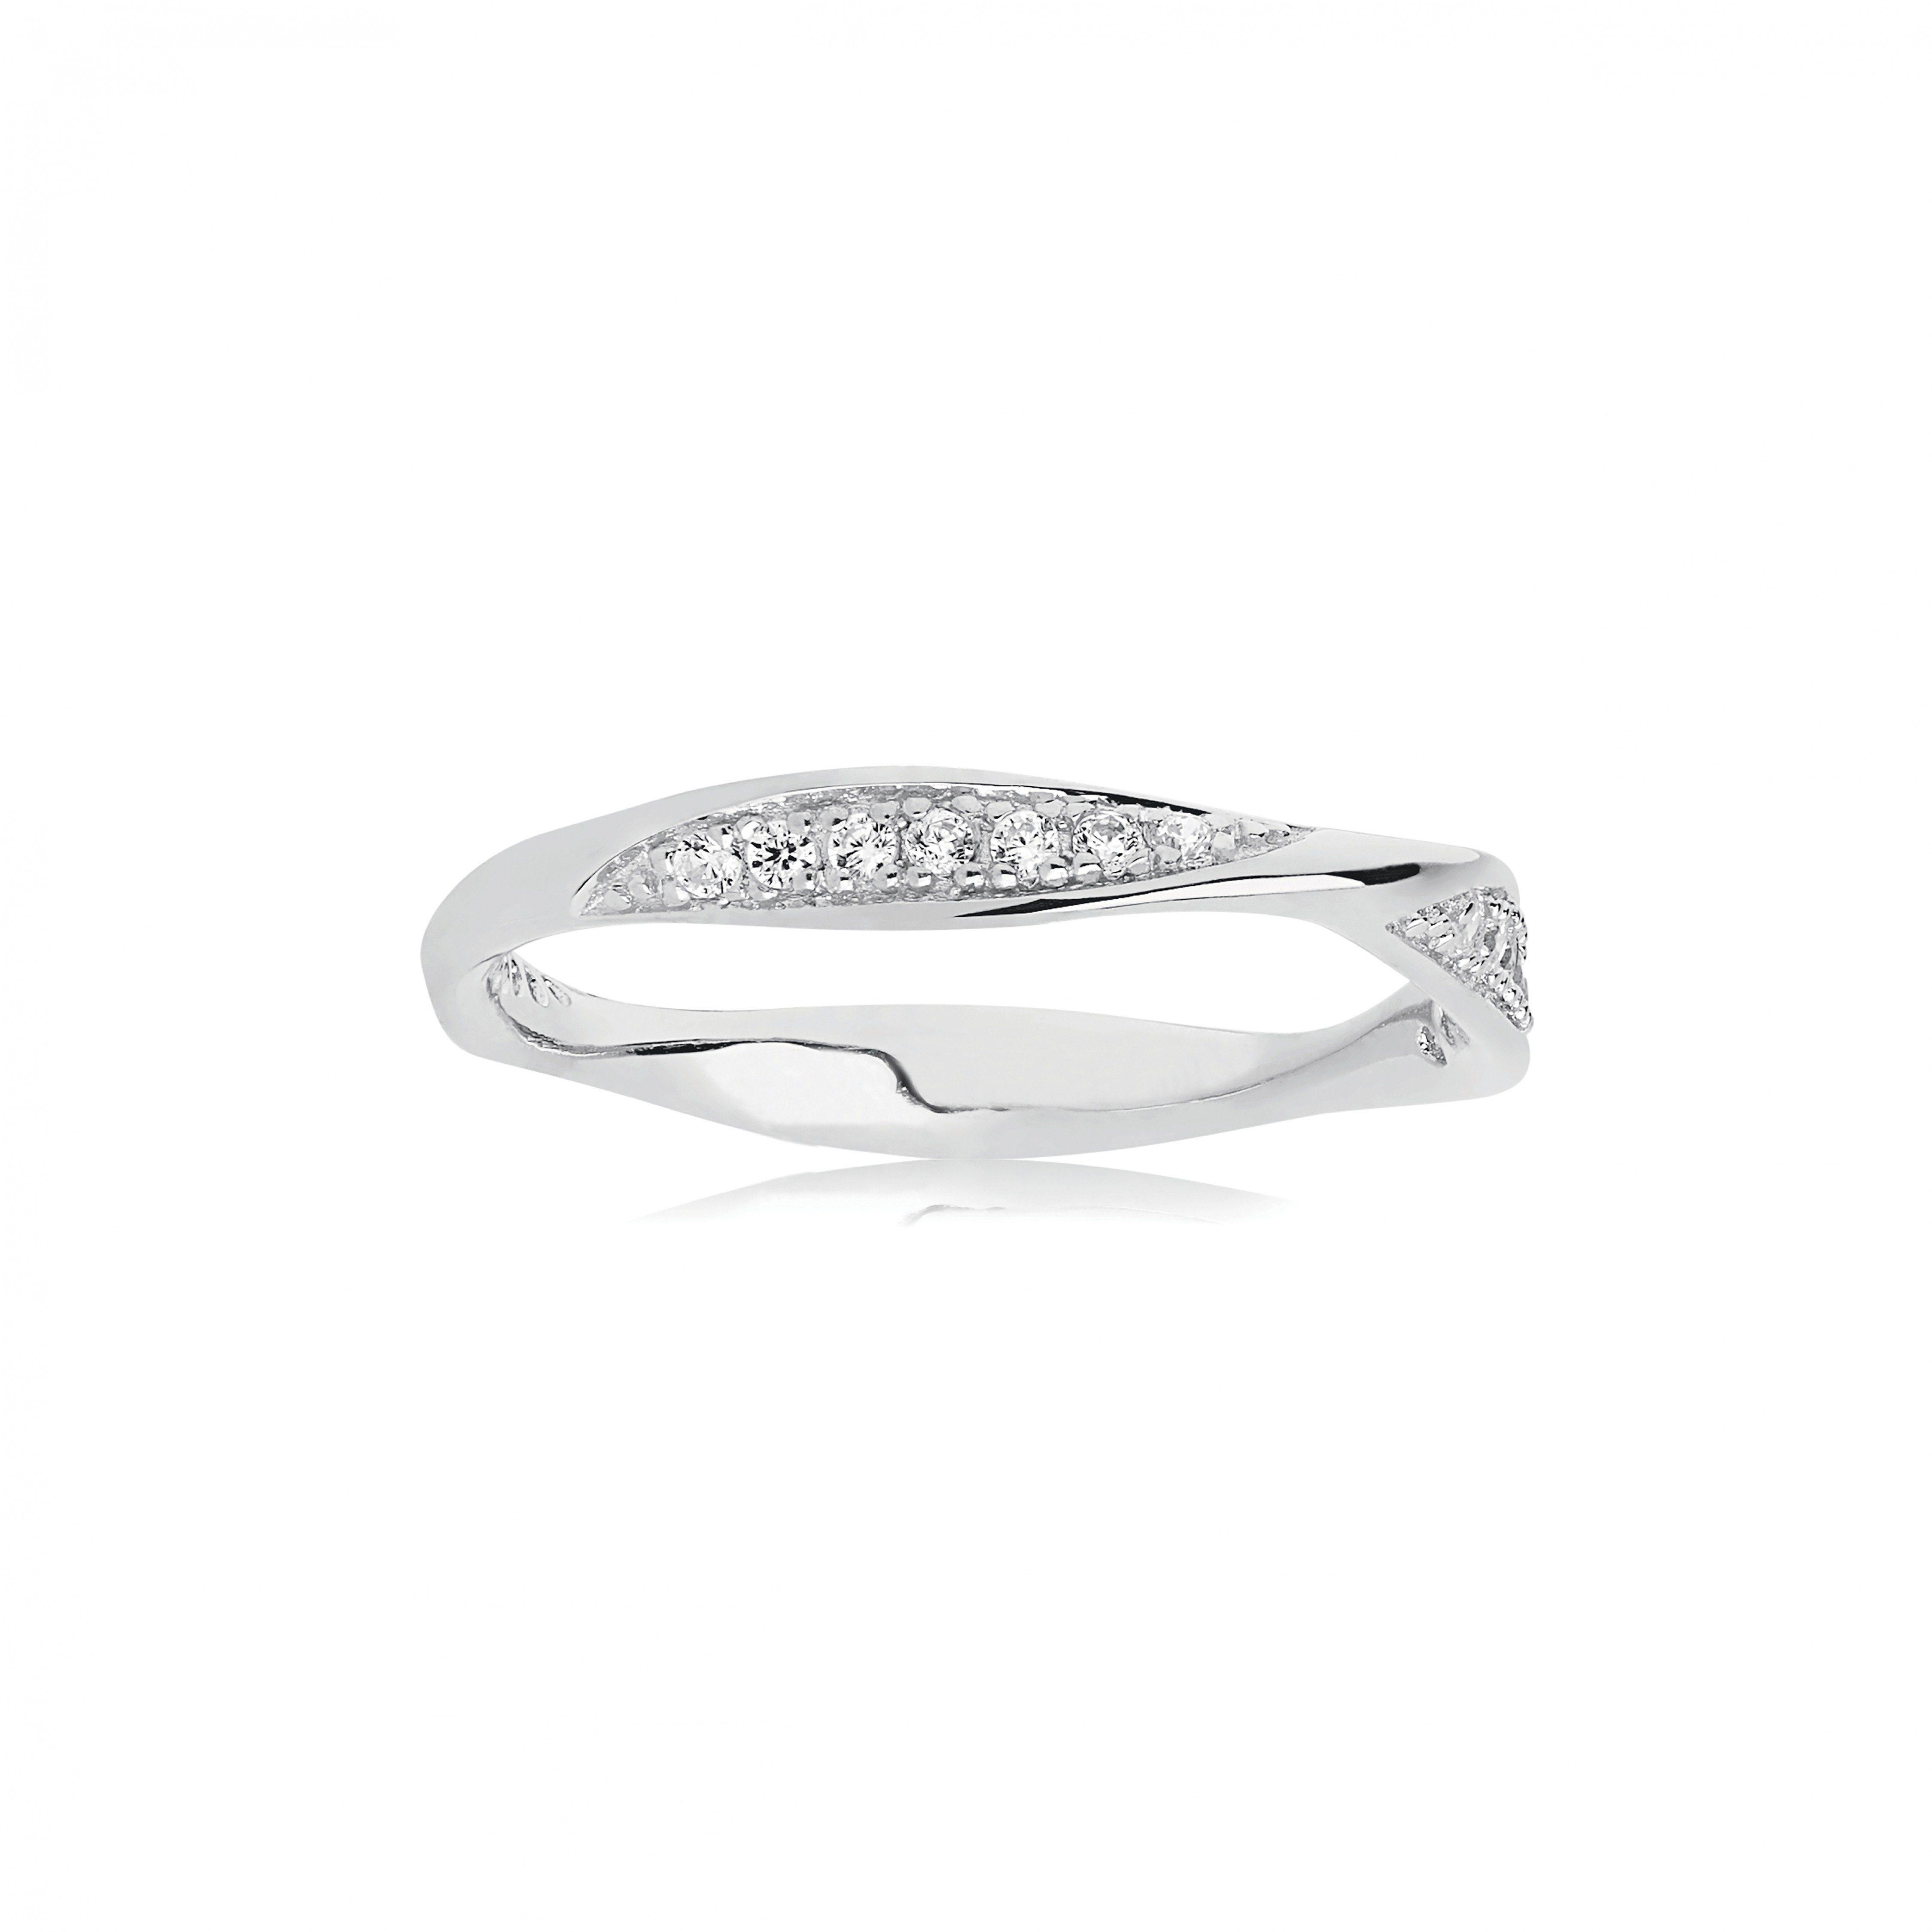 Sif Jakobs Jewellery Ring mit edlem Zirkonia Detail »CETARA« online kaufen   OTTO